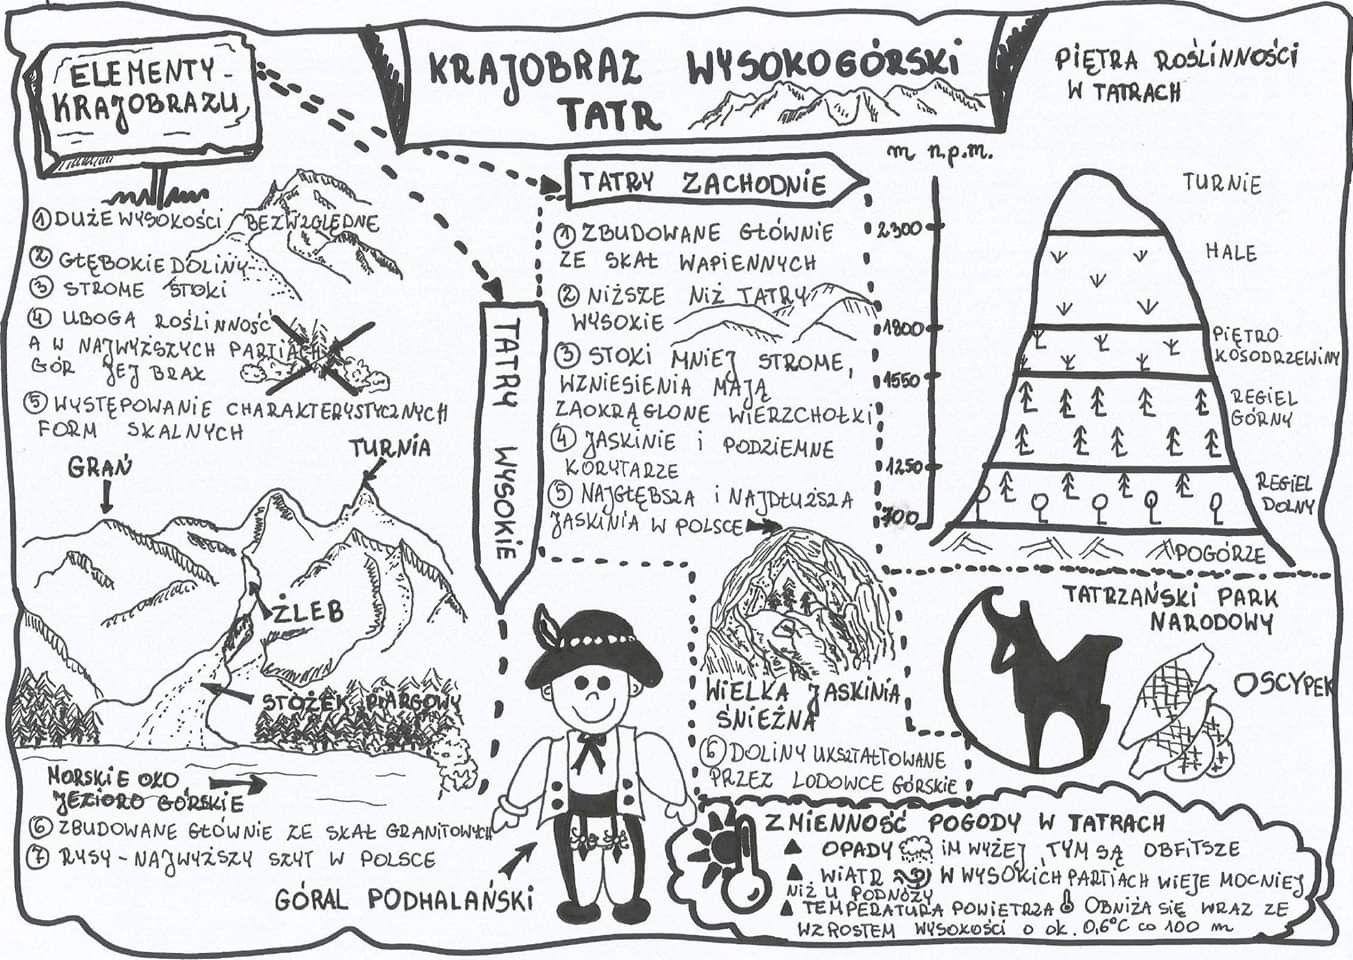 Pin By Kasia Jaromin On Geografia Kids Geography School